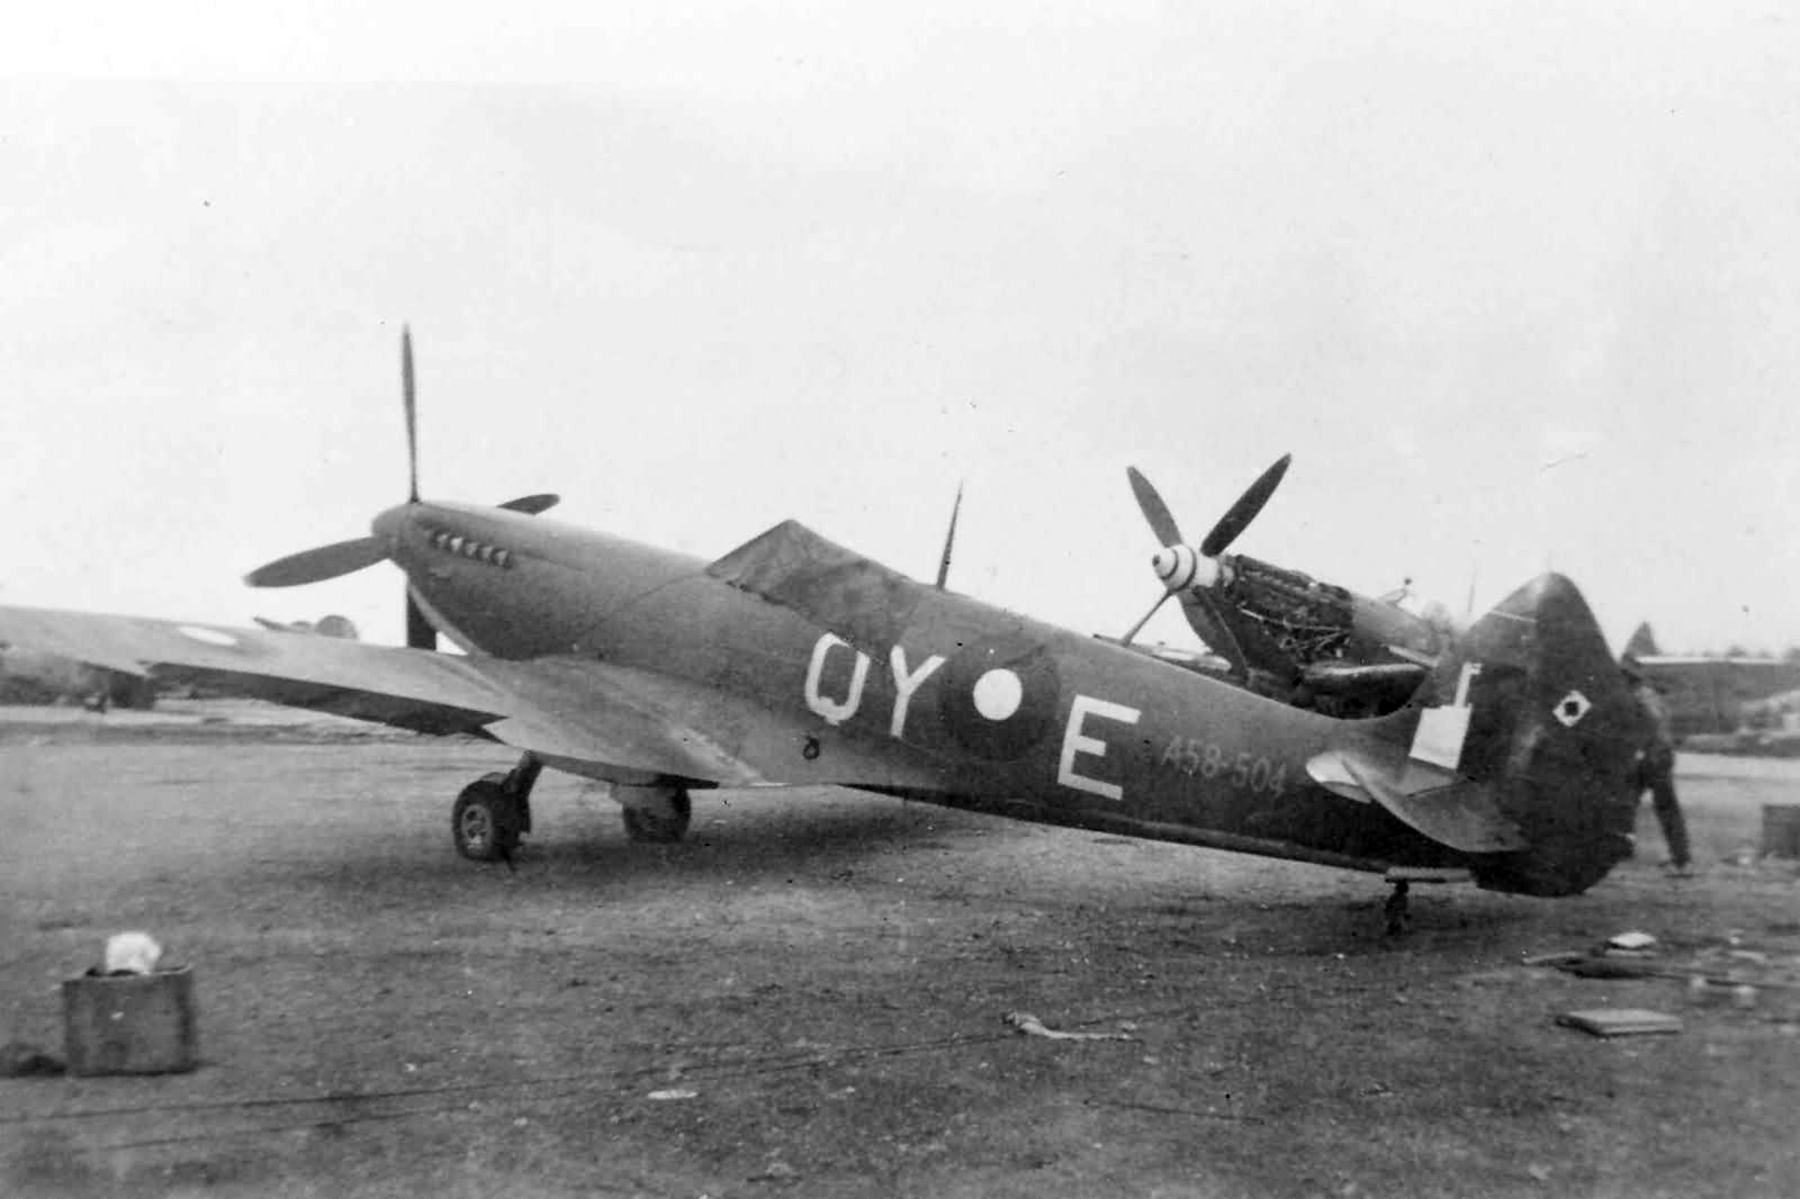 Spitfires MkVIII RAAF 452Sqn QYE A58 504 01